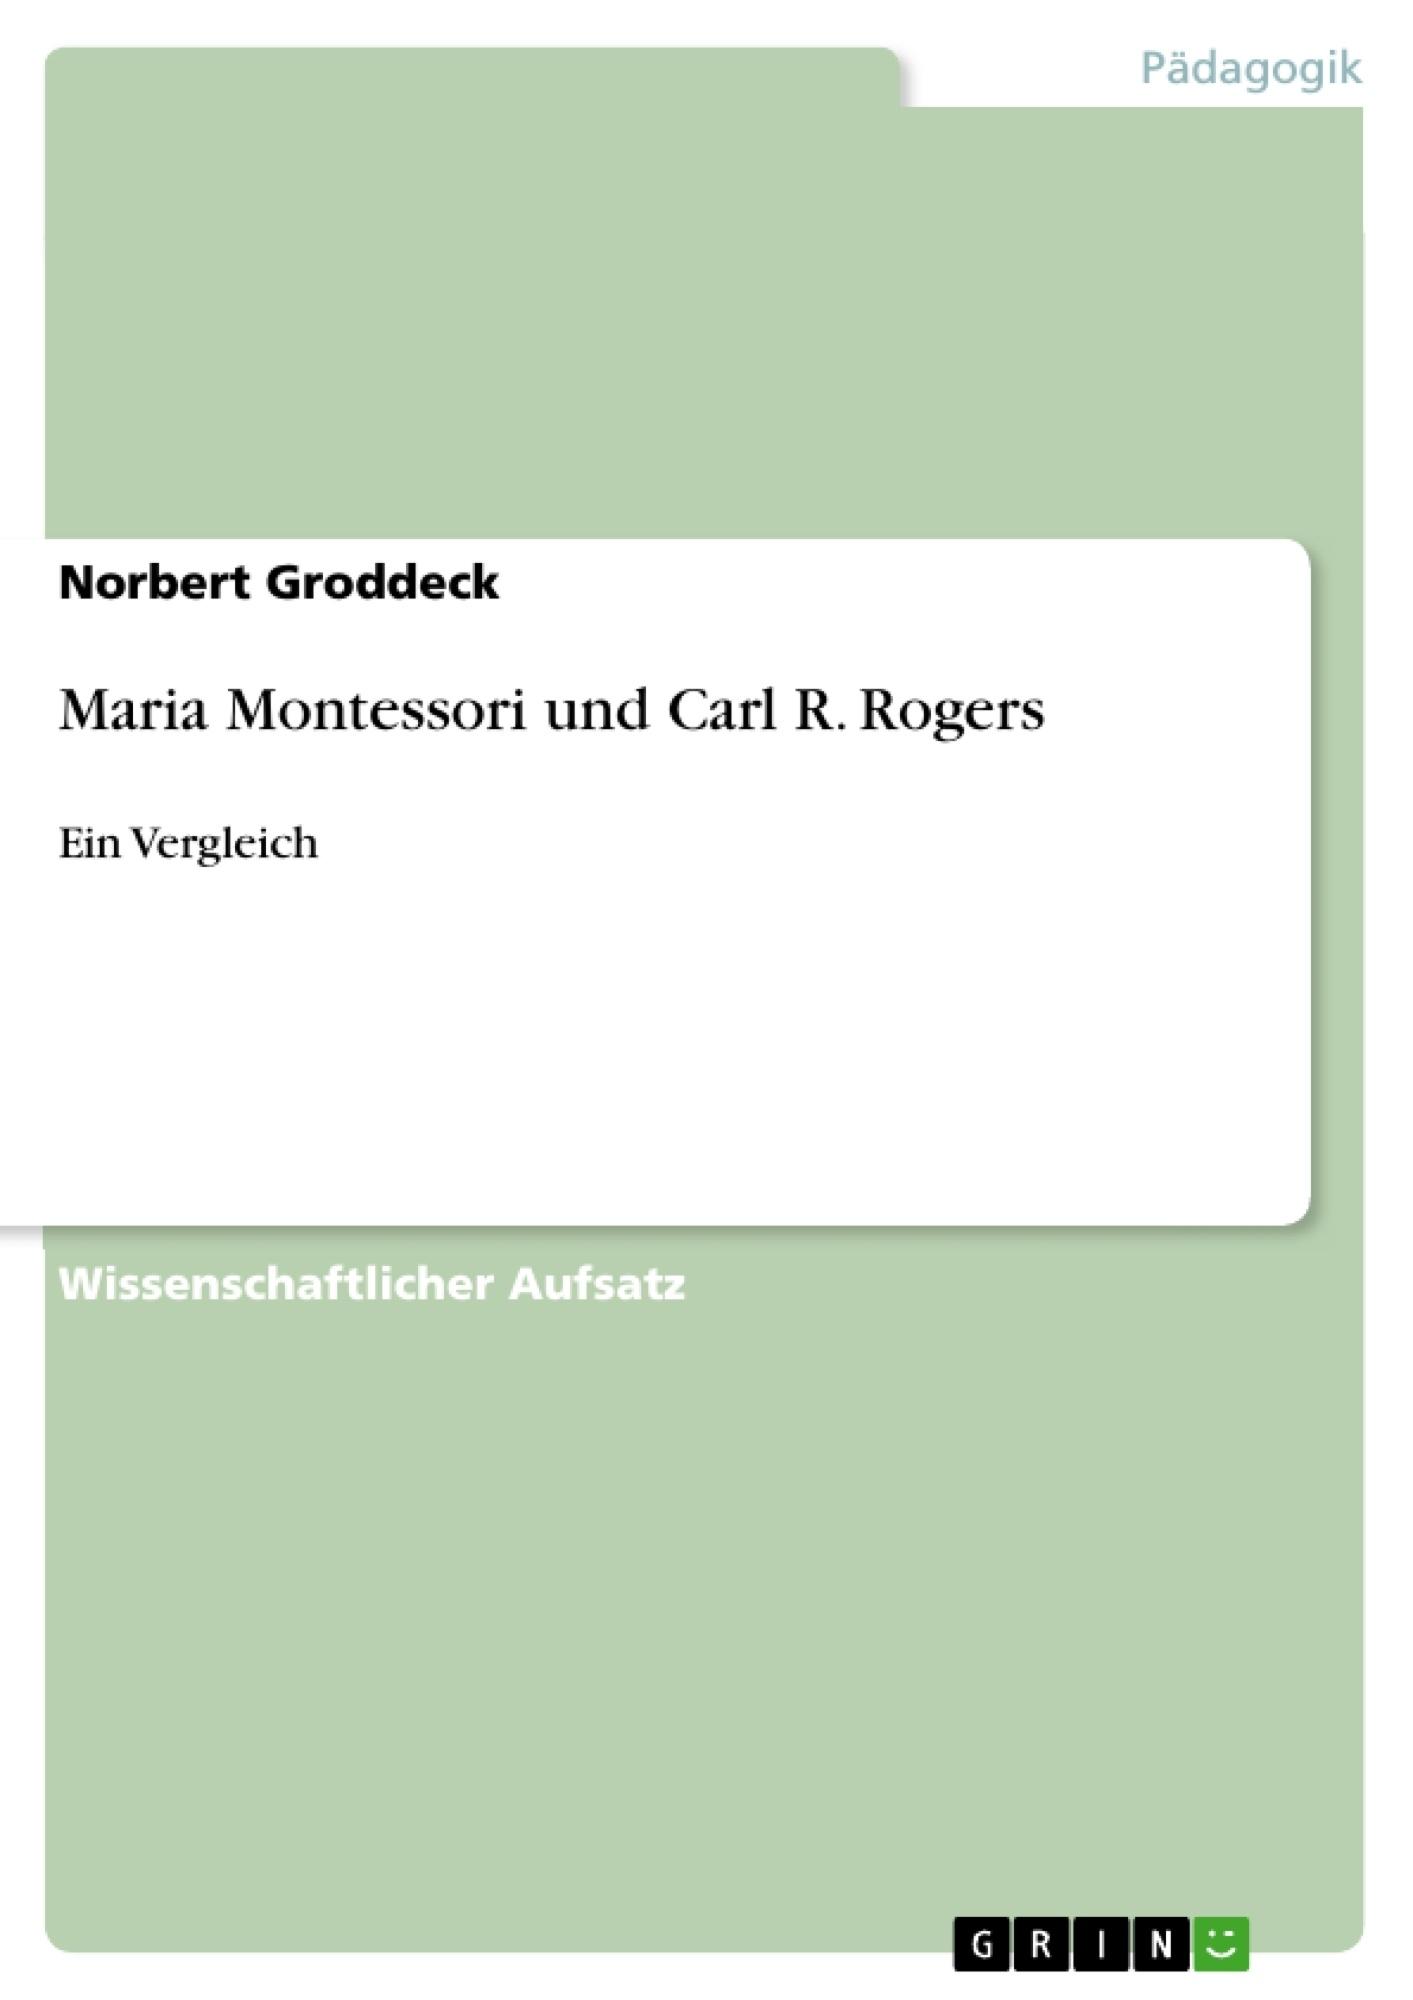 Titel: Maria Montessori und Carl R. Rogers